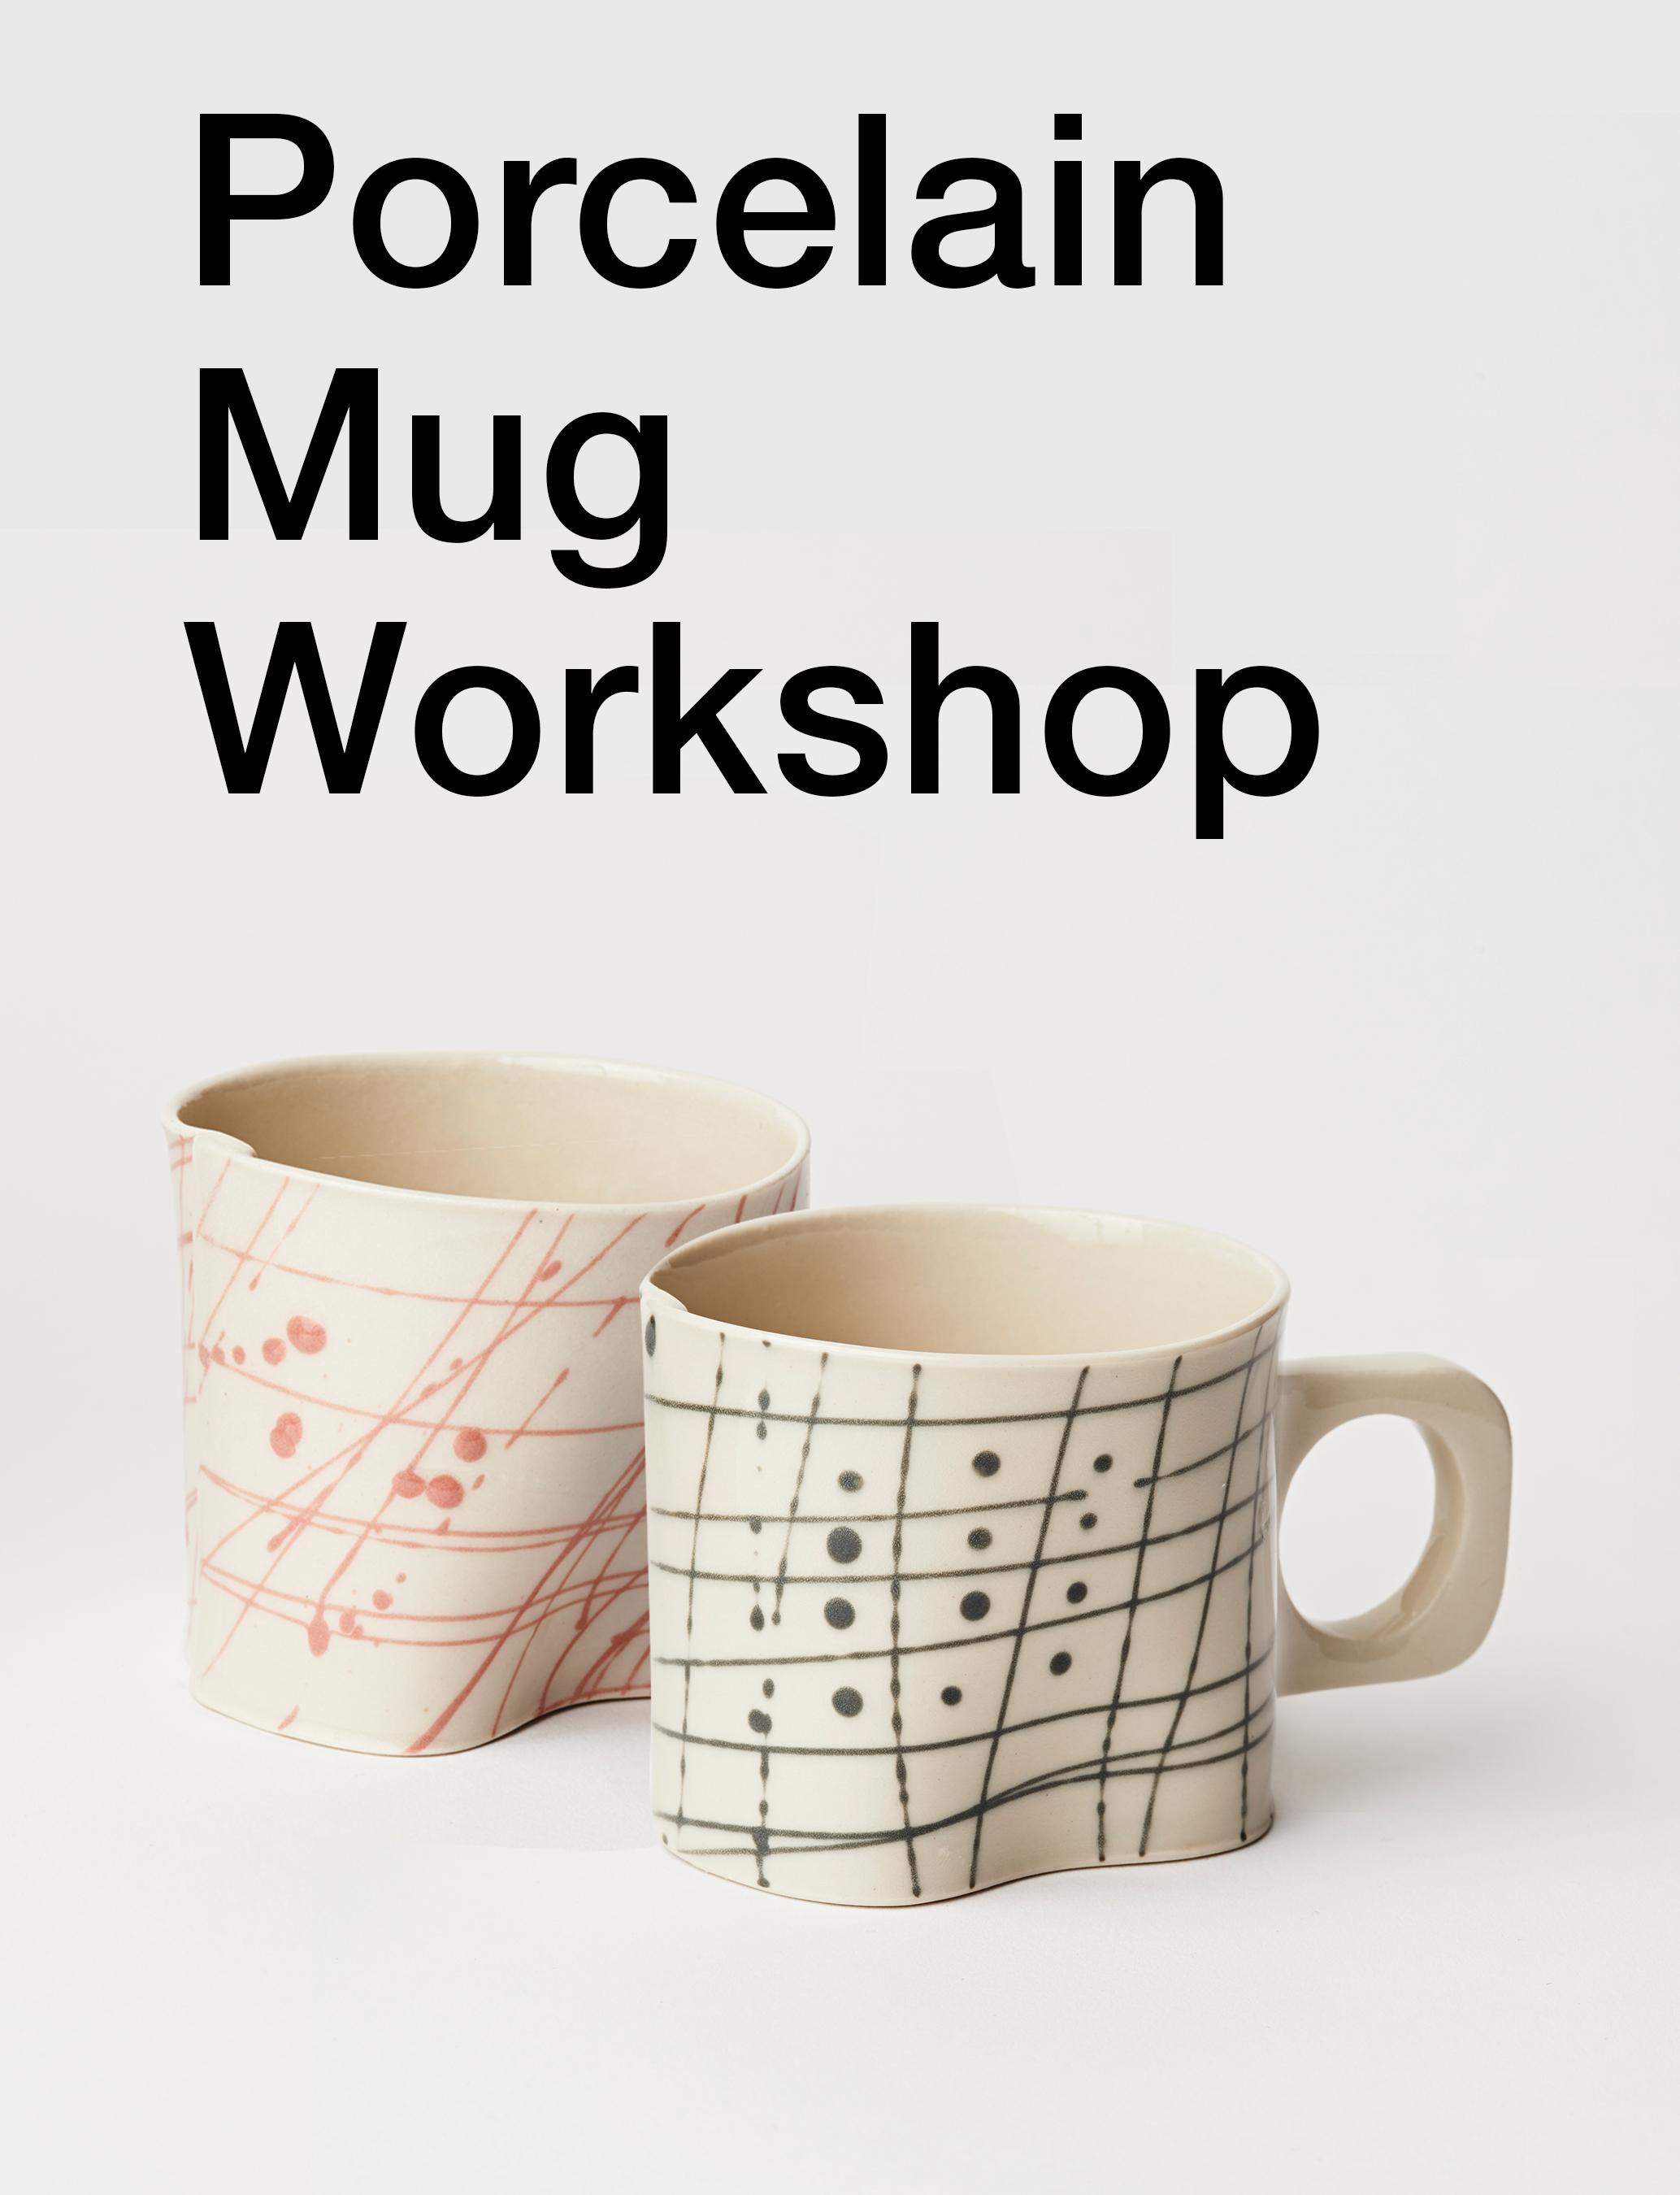 Porcelain Mug Workshop — Wilcoxson Brooklyn Ceramics